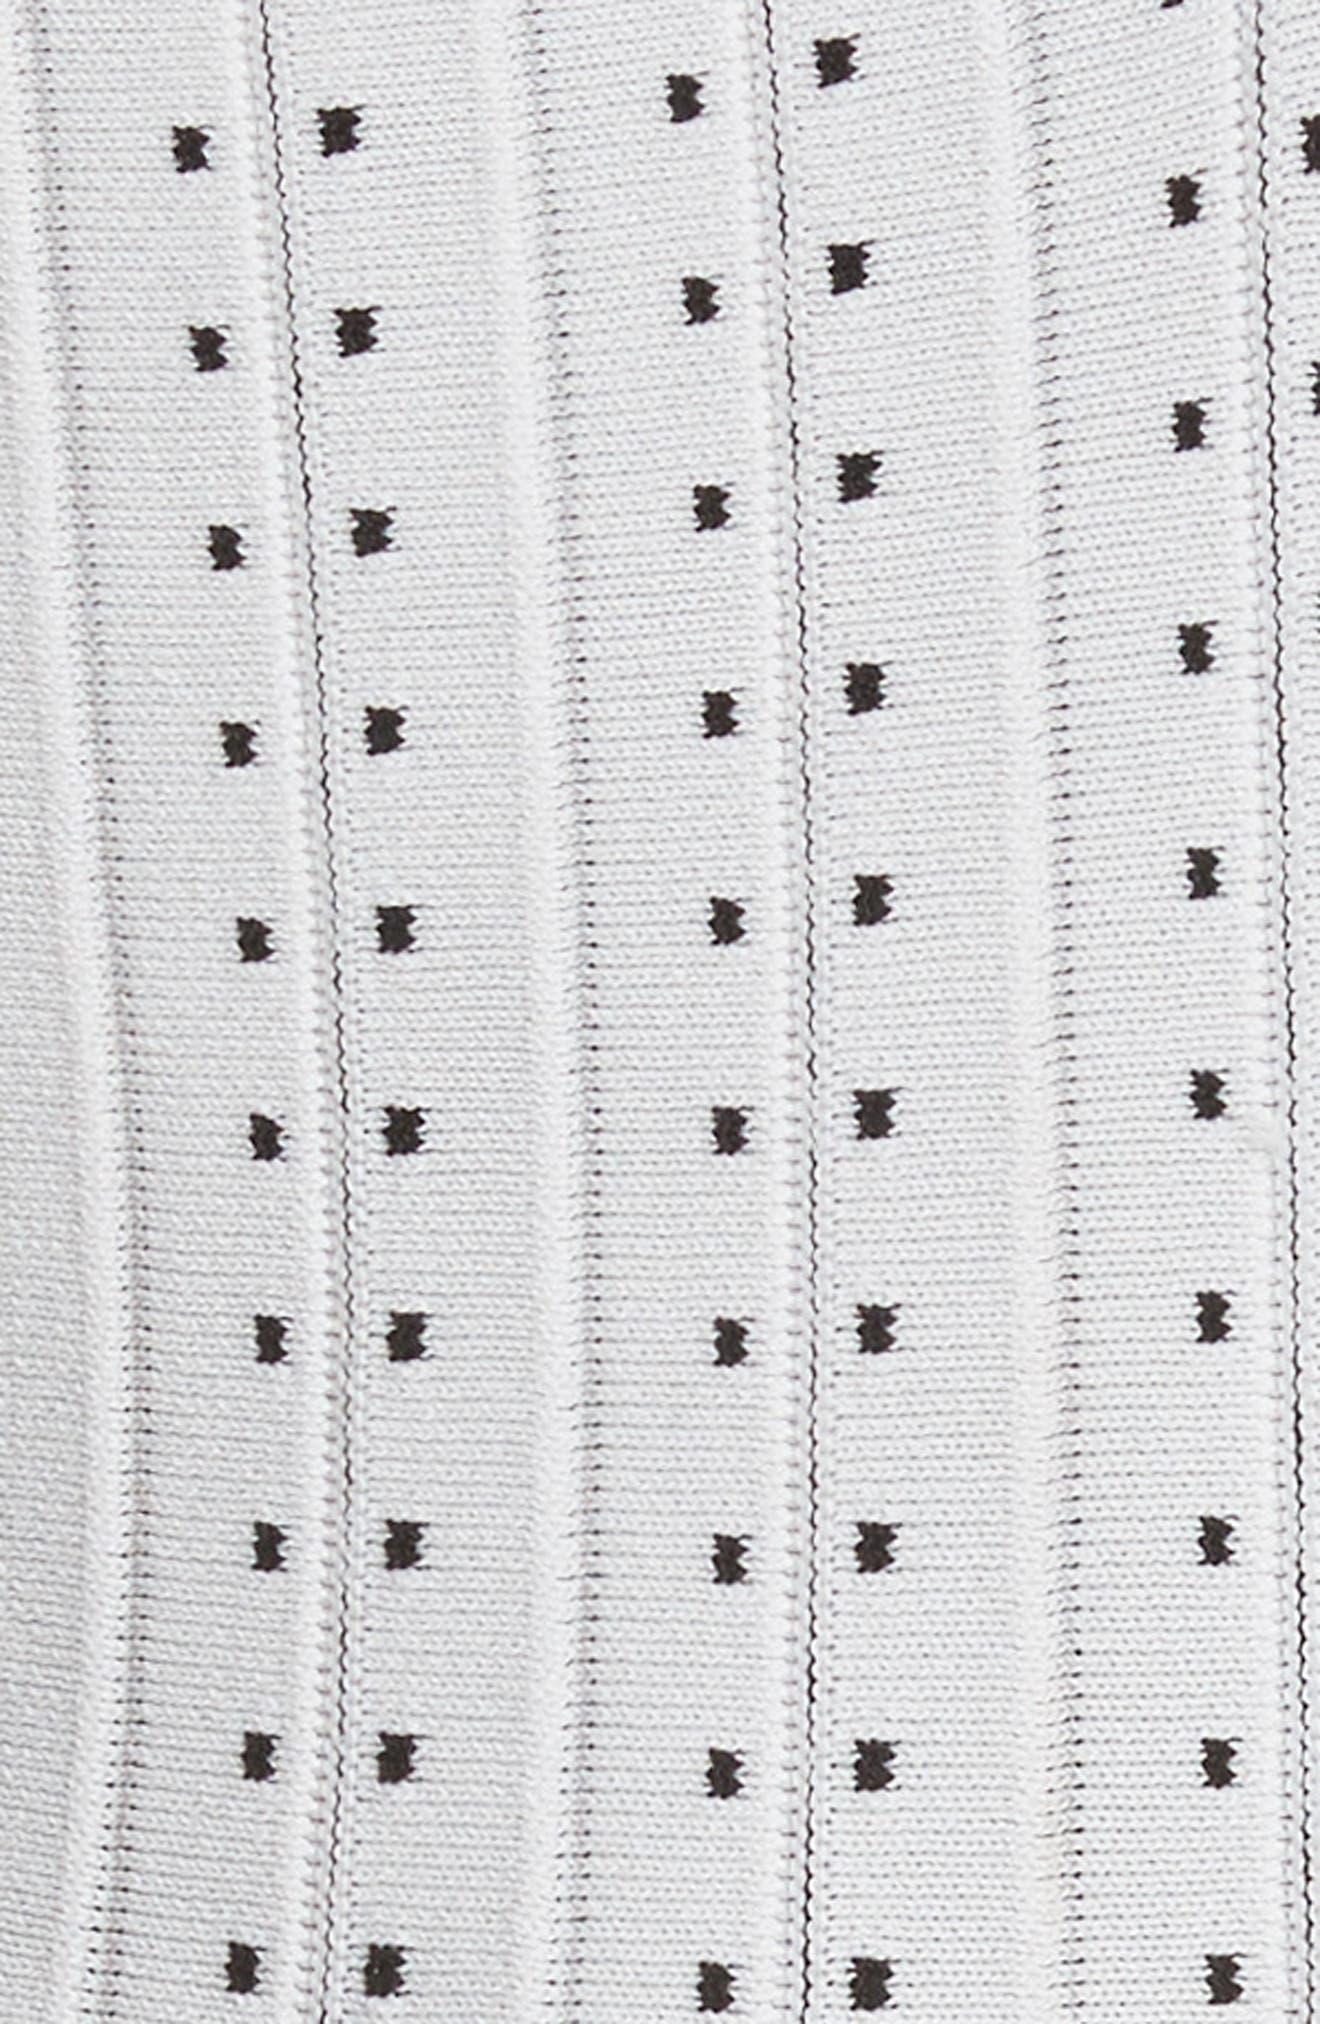 Dot Pleat Fit & Flare Dress,                             Alternate thumbnail 5, color,                             110